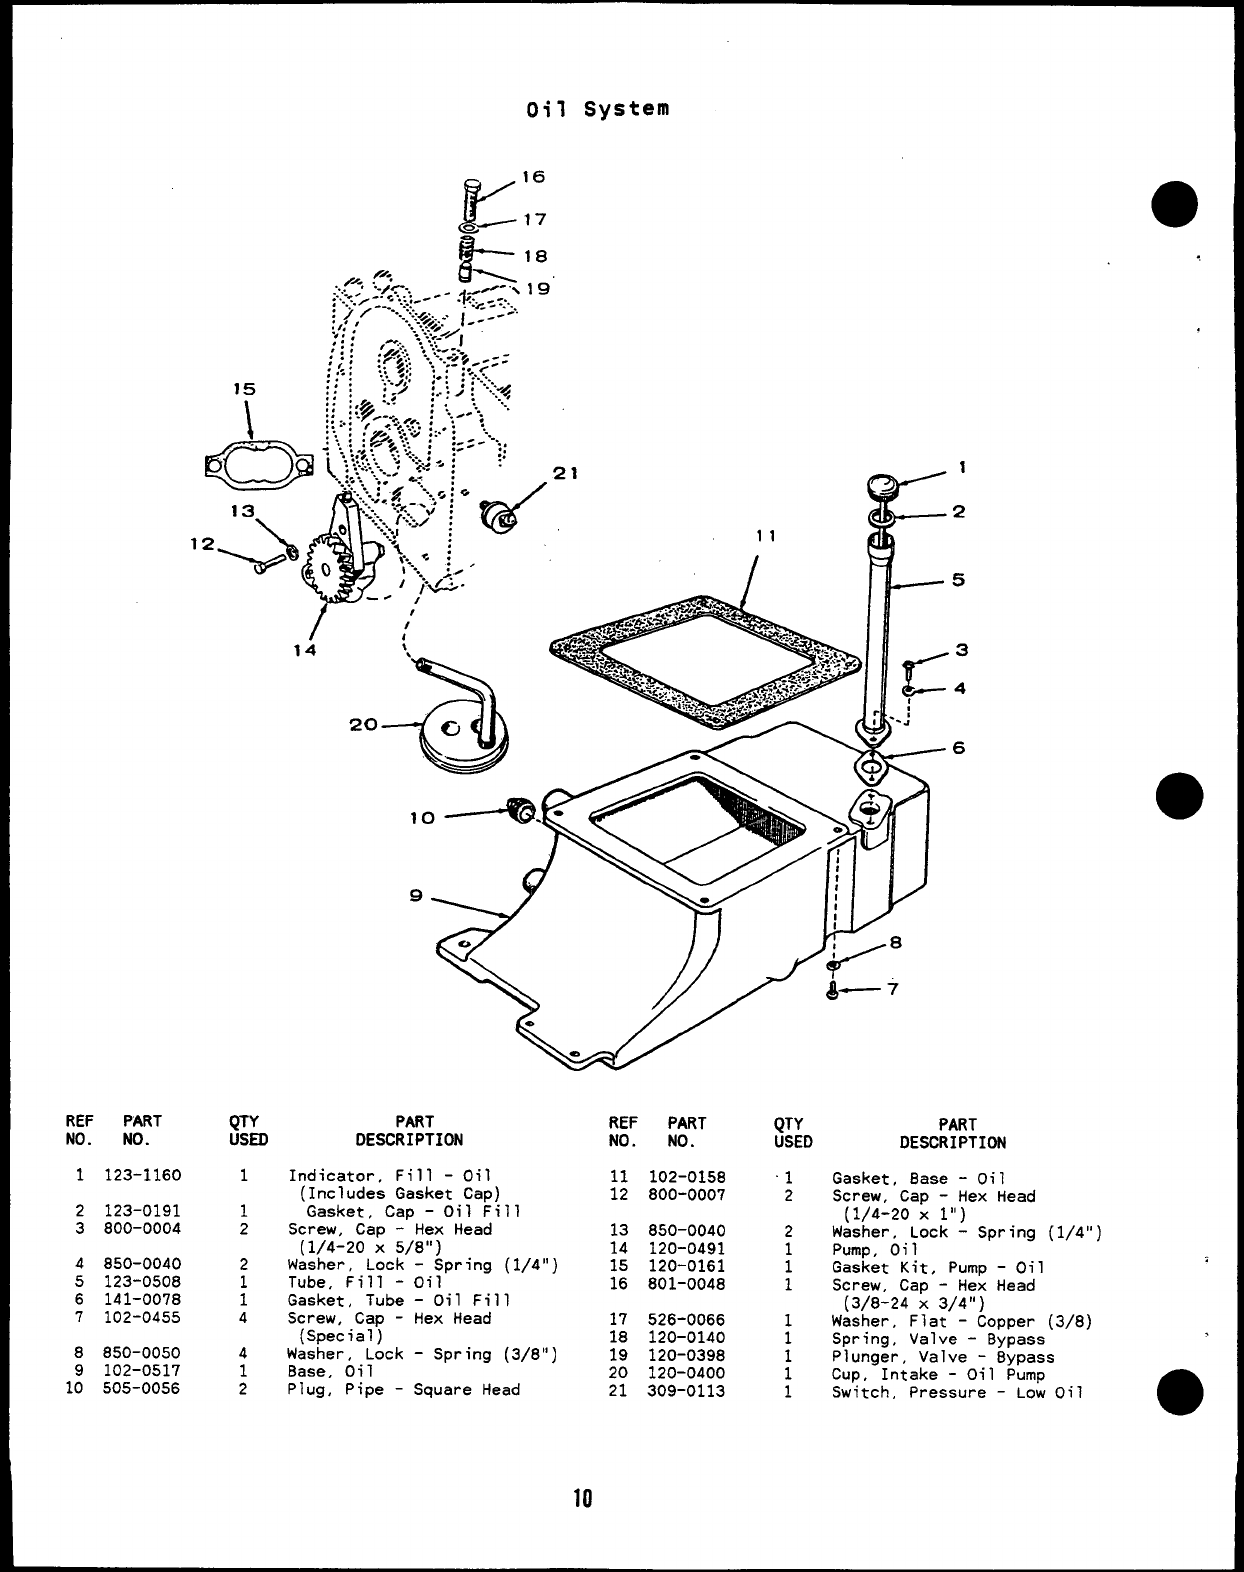 927 0224 Onan MCCK (spec H J) Marine Genset Parts Manual